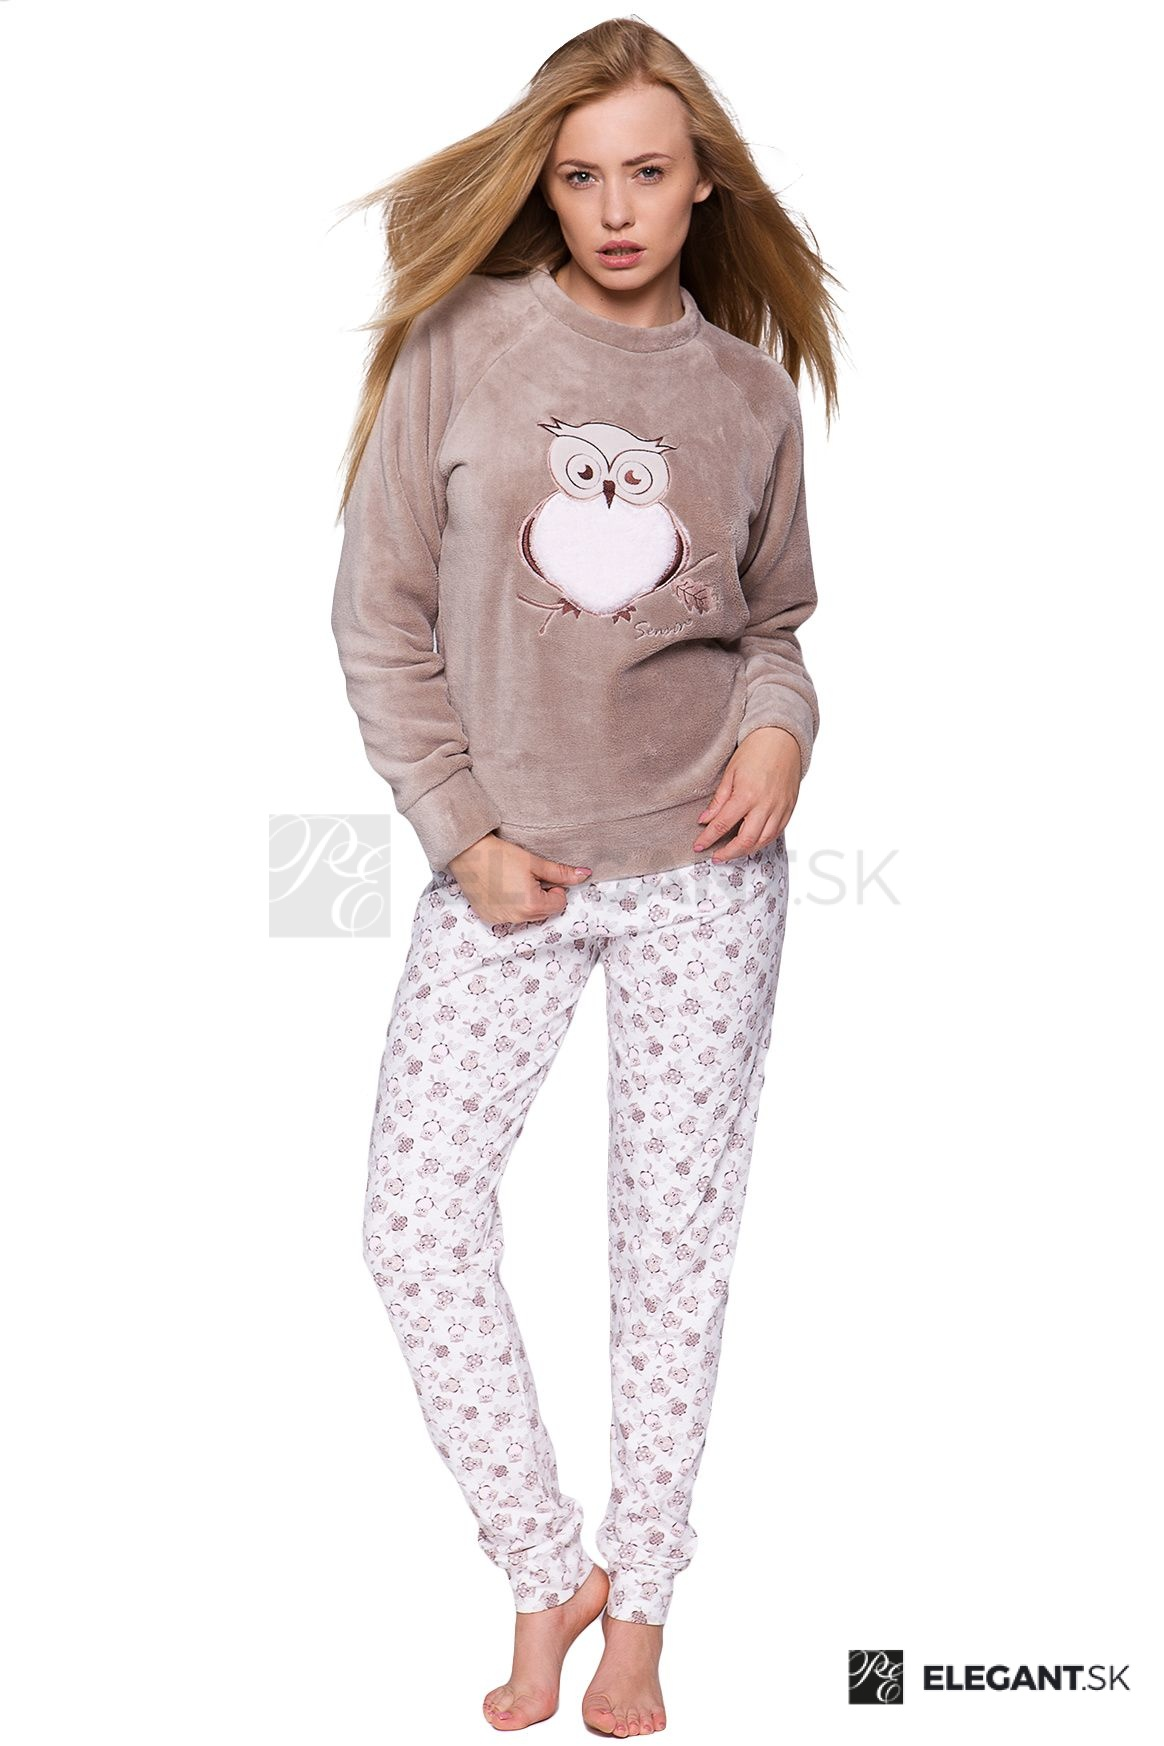 0aafc24b3e75 Dámske hrejivé soft pyžamo Sova béžové - ELEGANT.sk